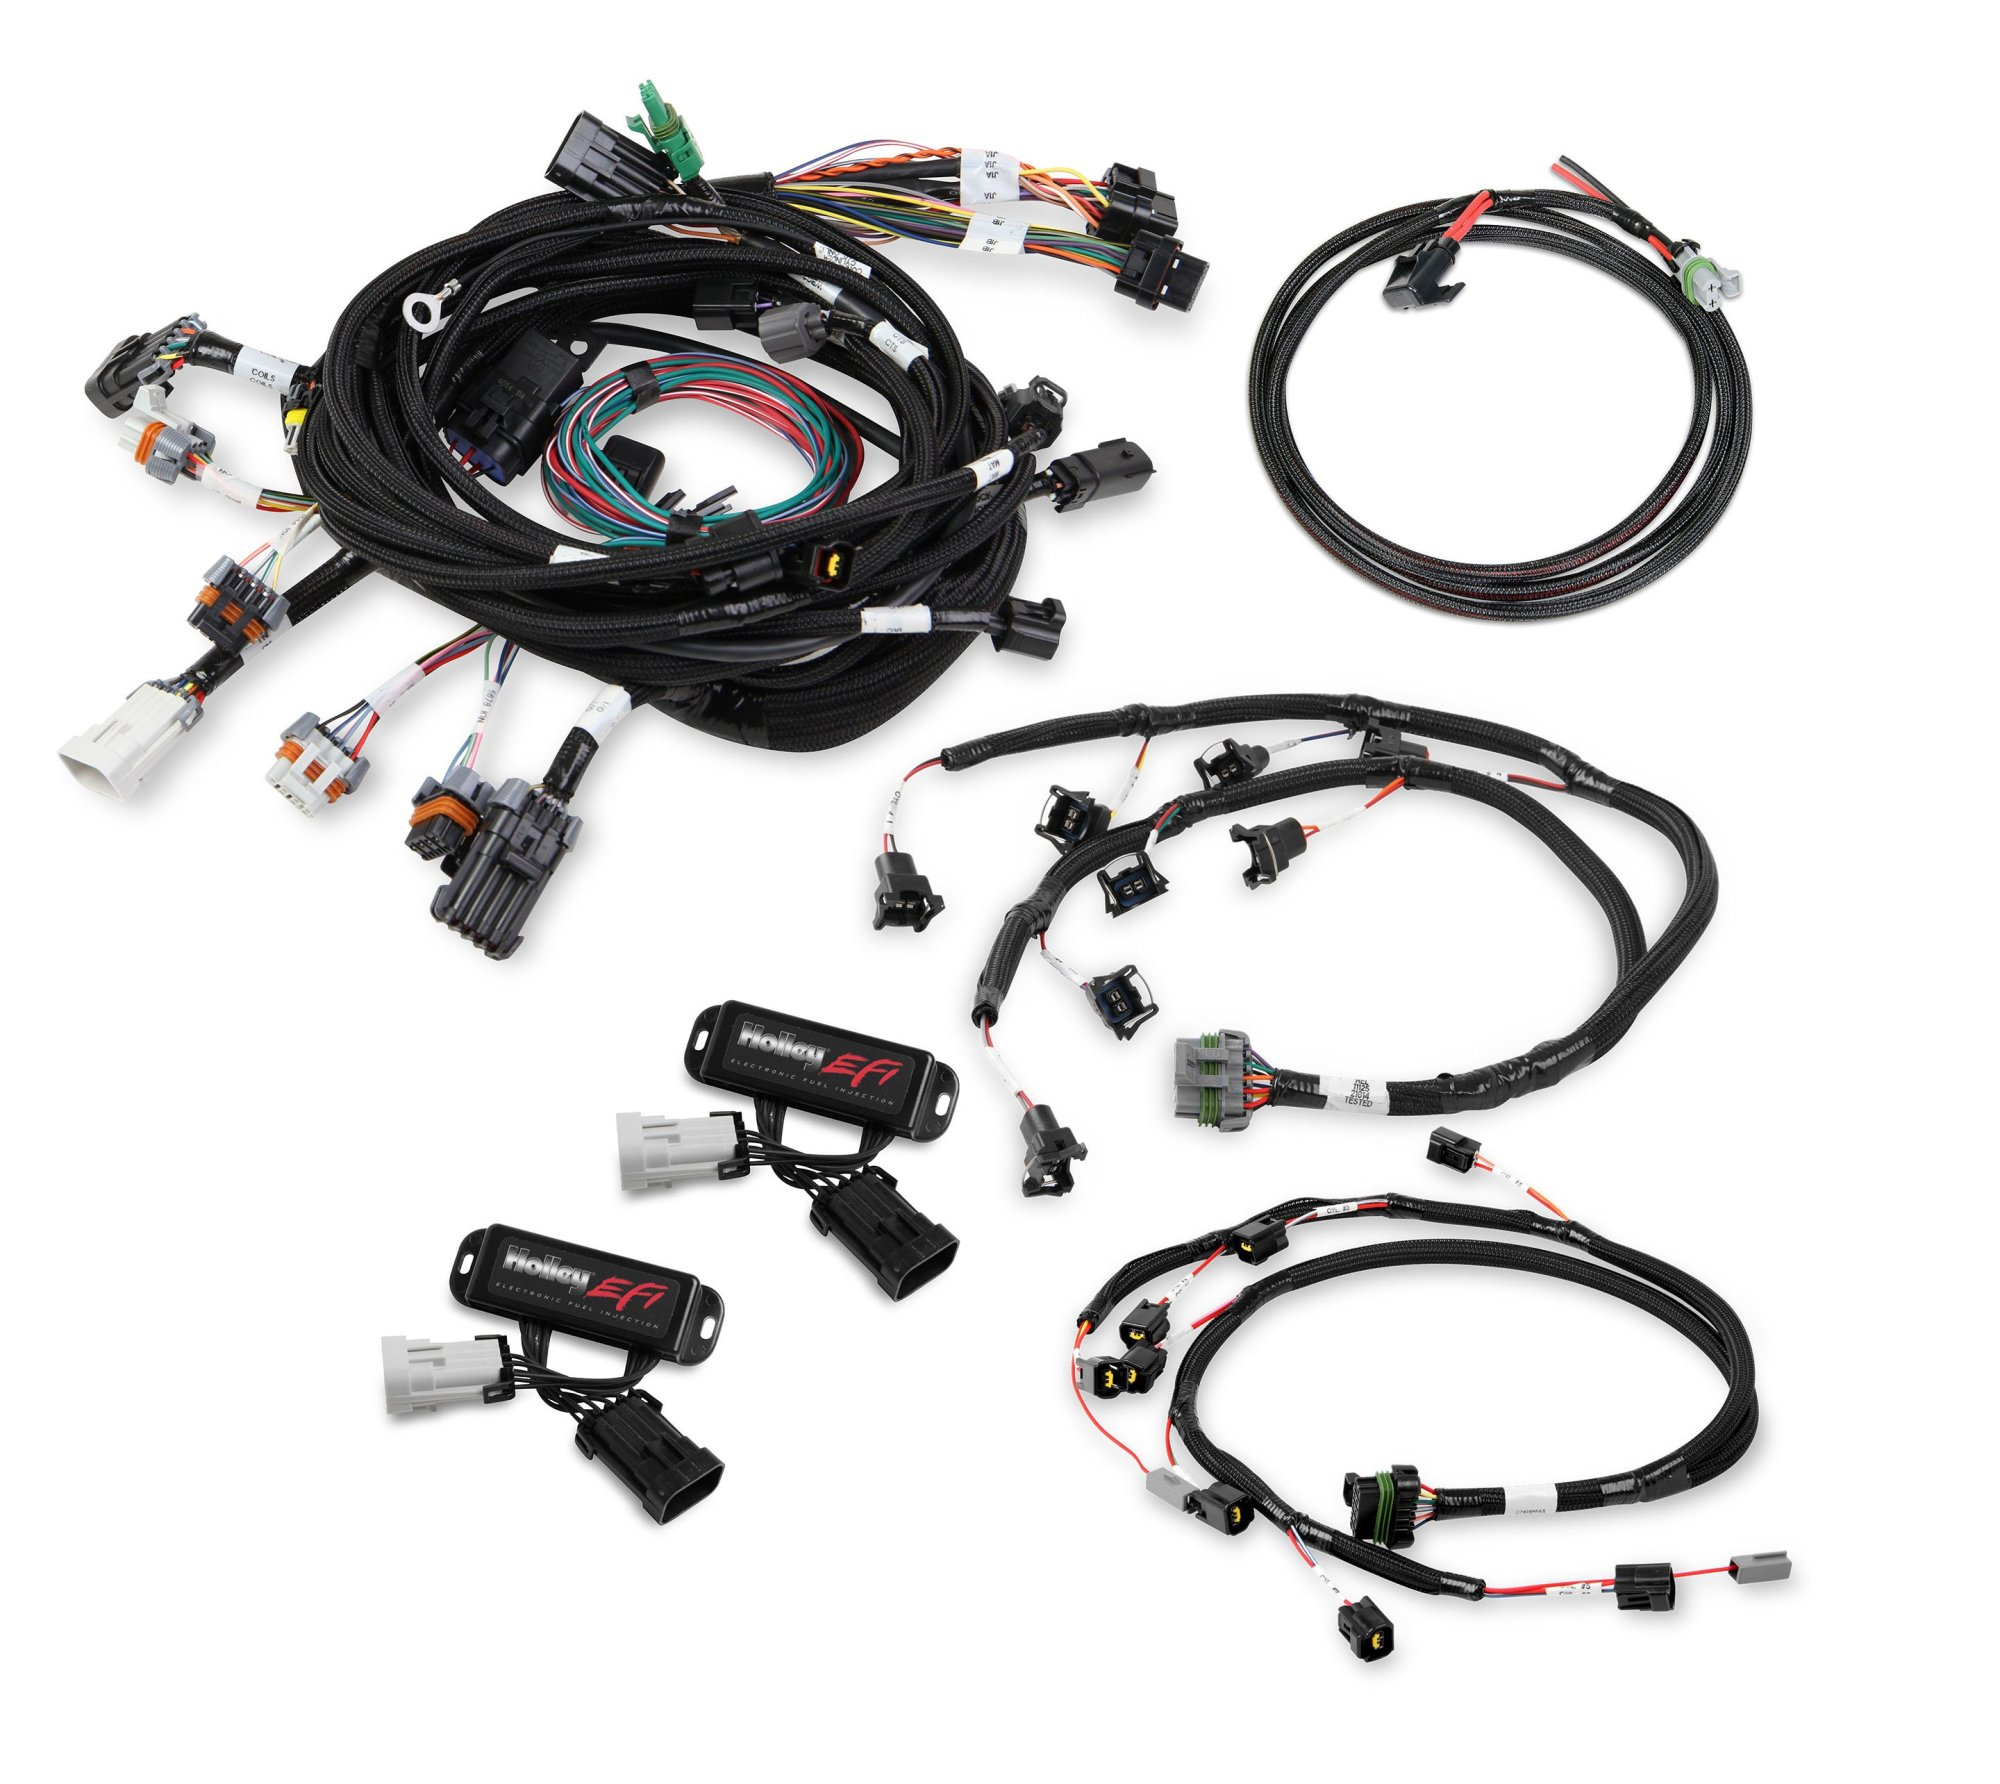 hight resolution of 558 505 ford modular 2 valve efi harness kit image